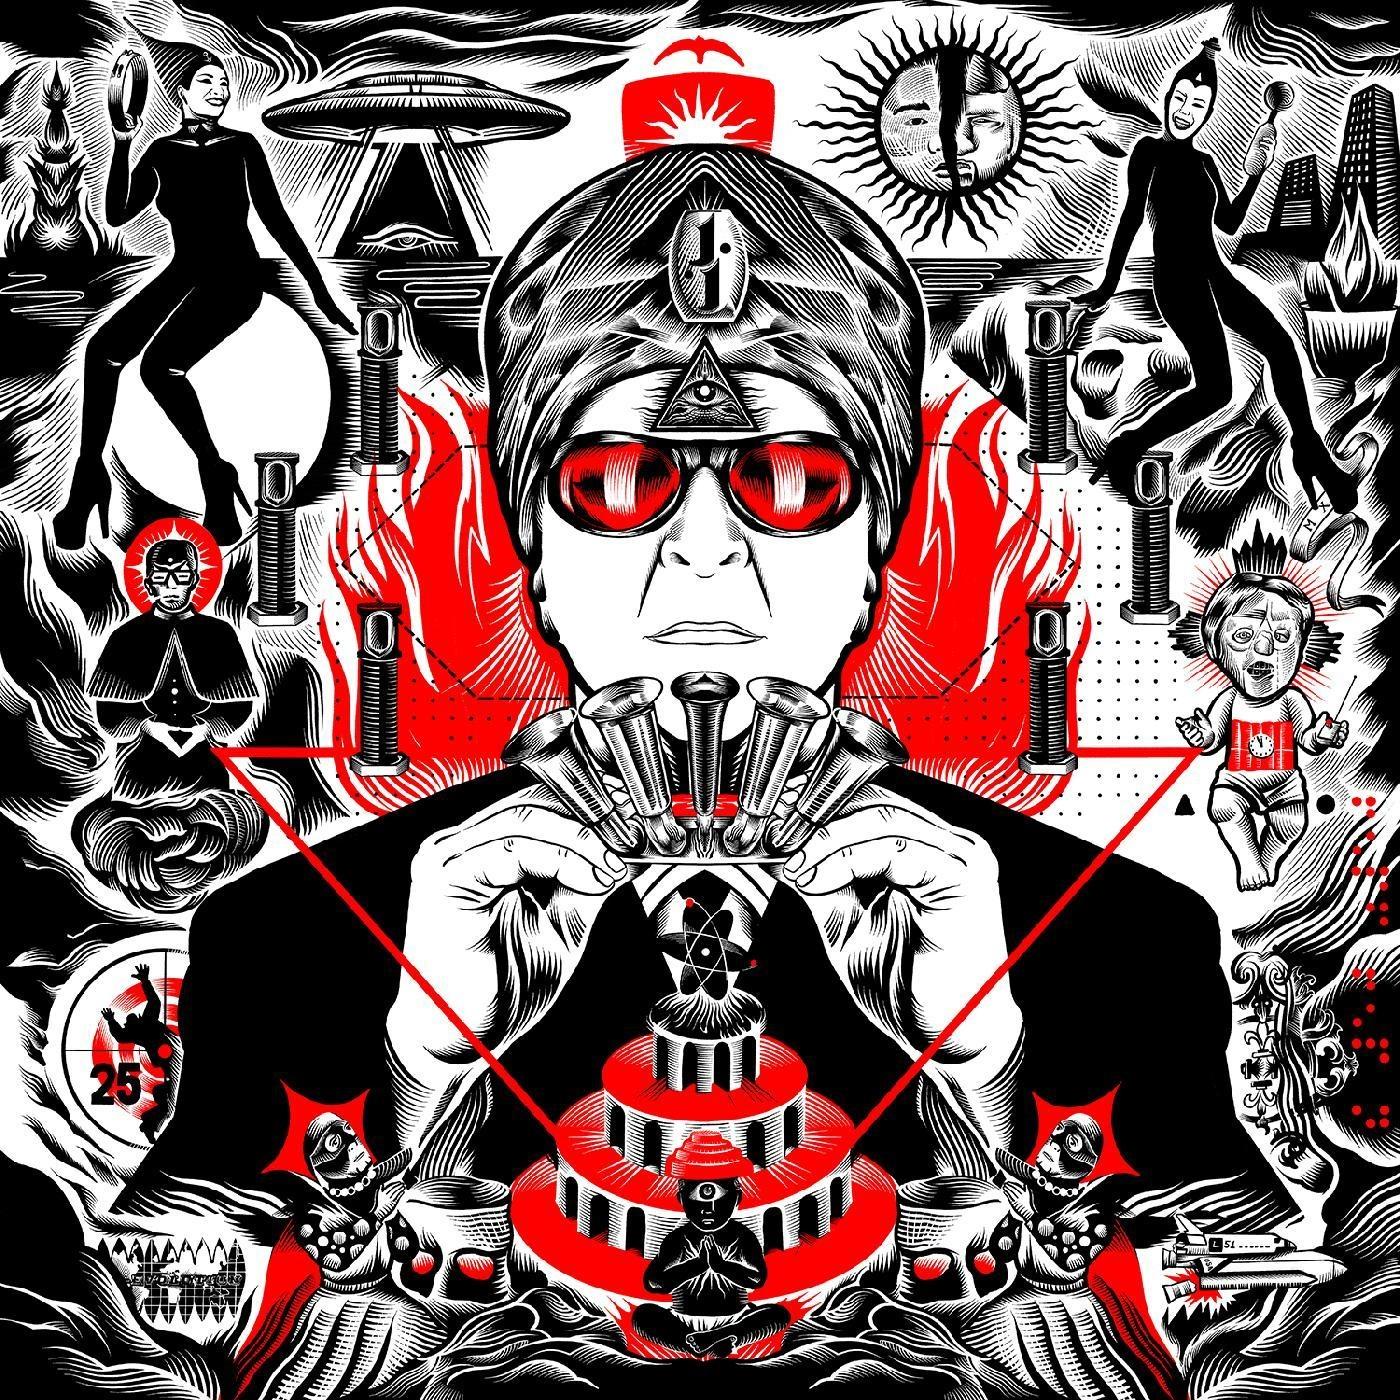 Devo's Gerald V. Casale • AKA Jihad Jerry & The Evildoers (RSD2021)-1